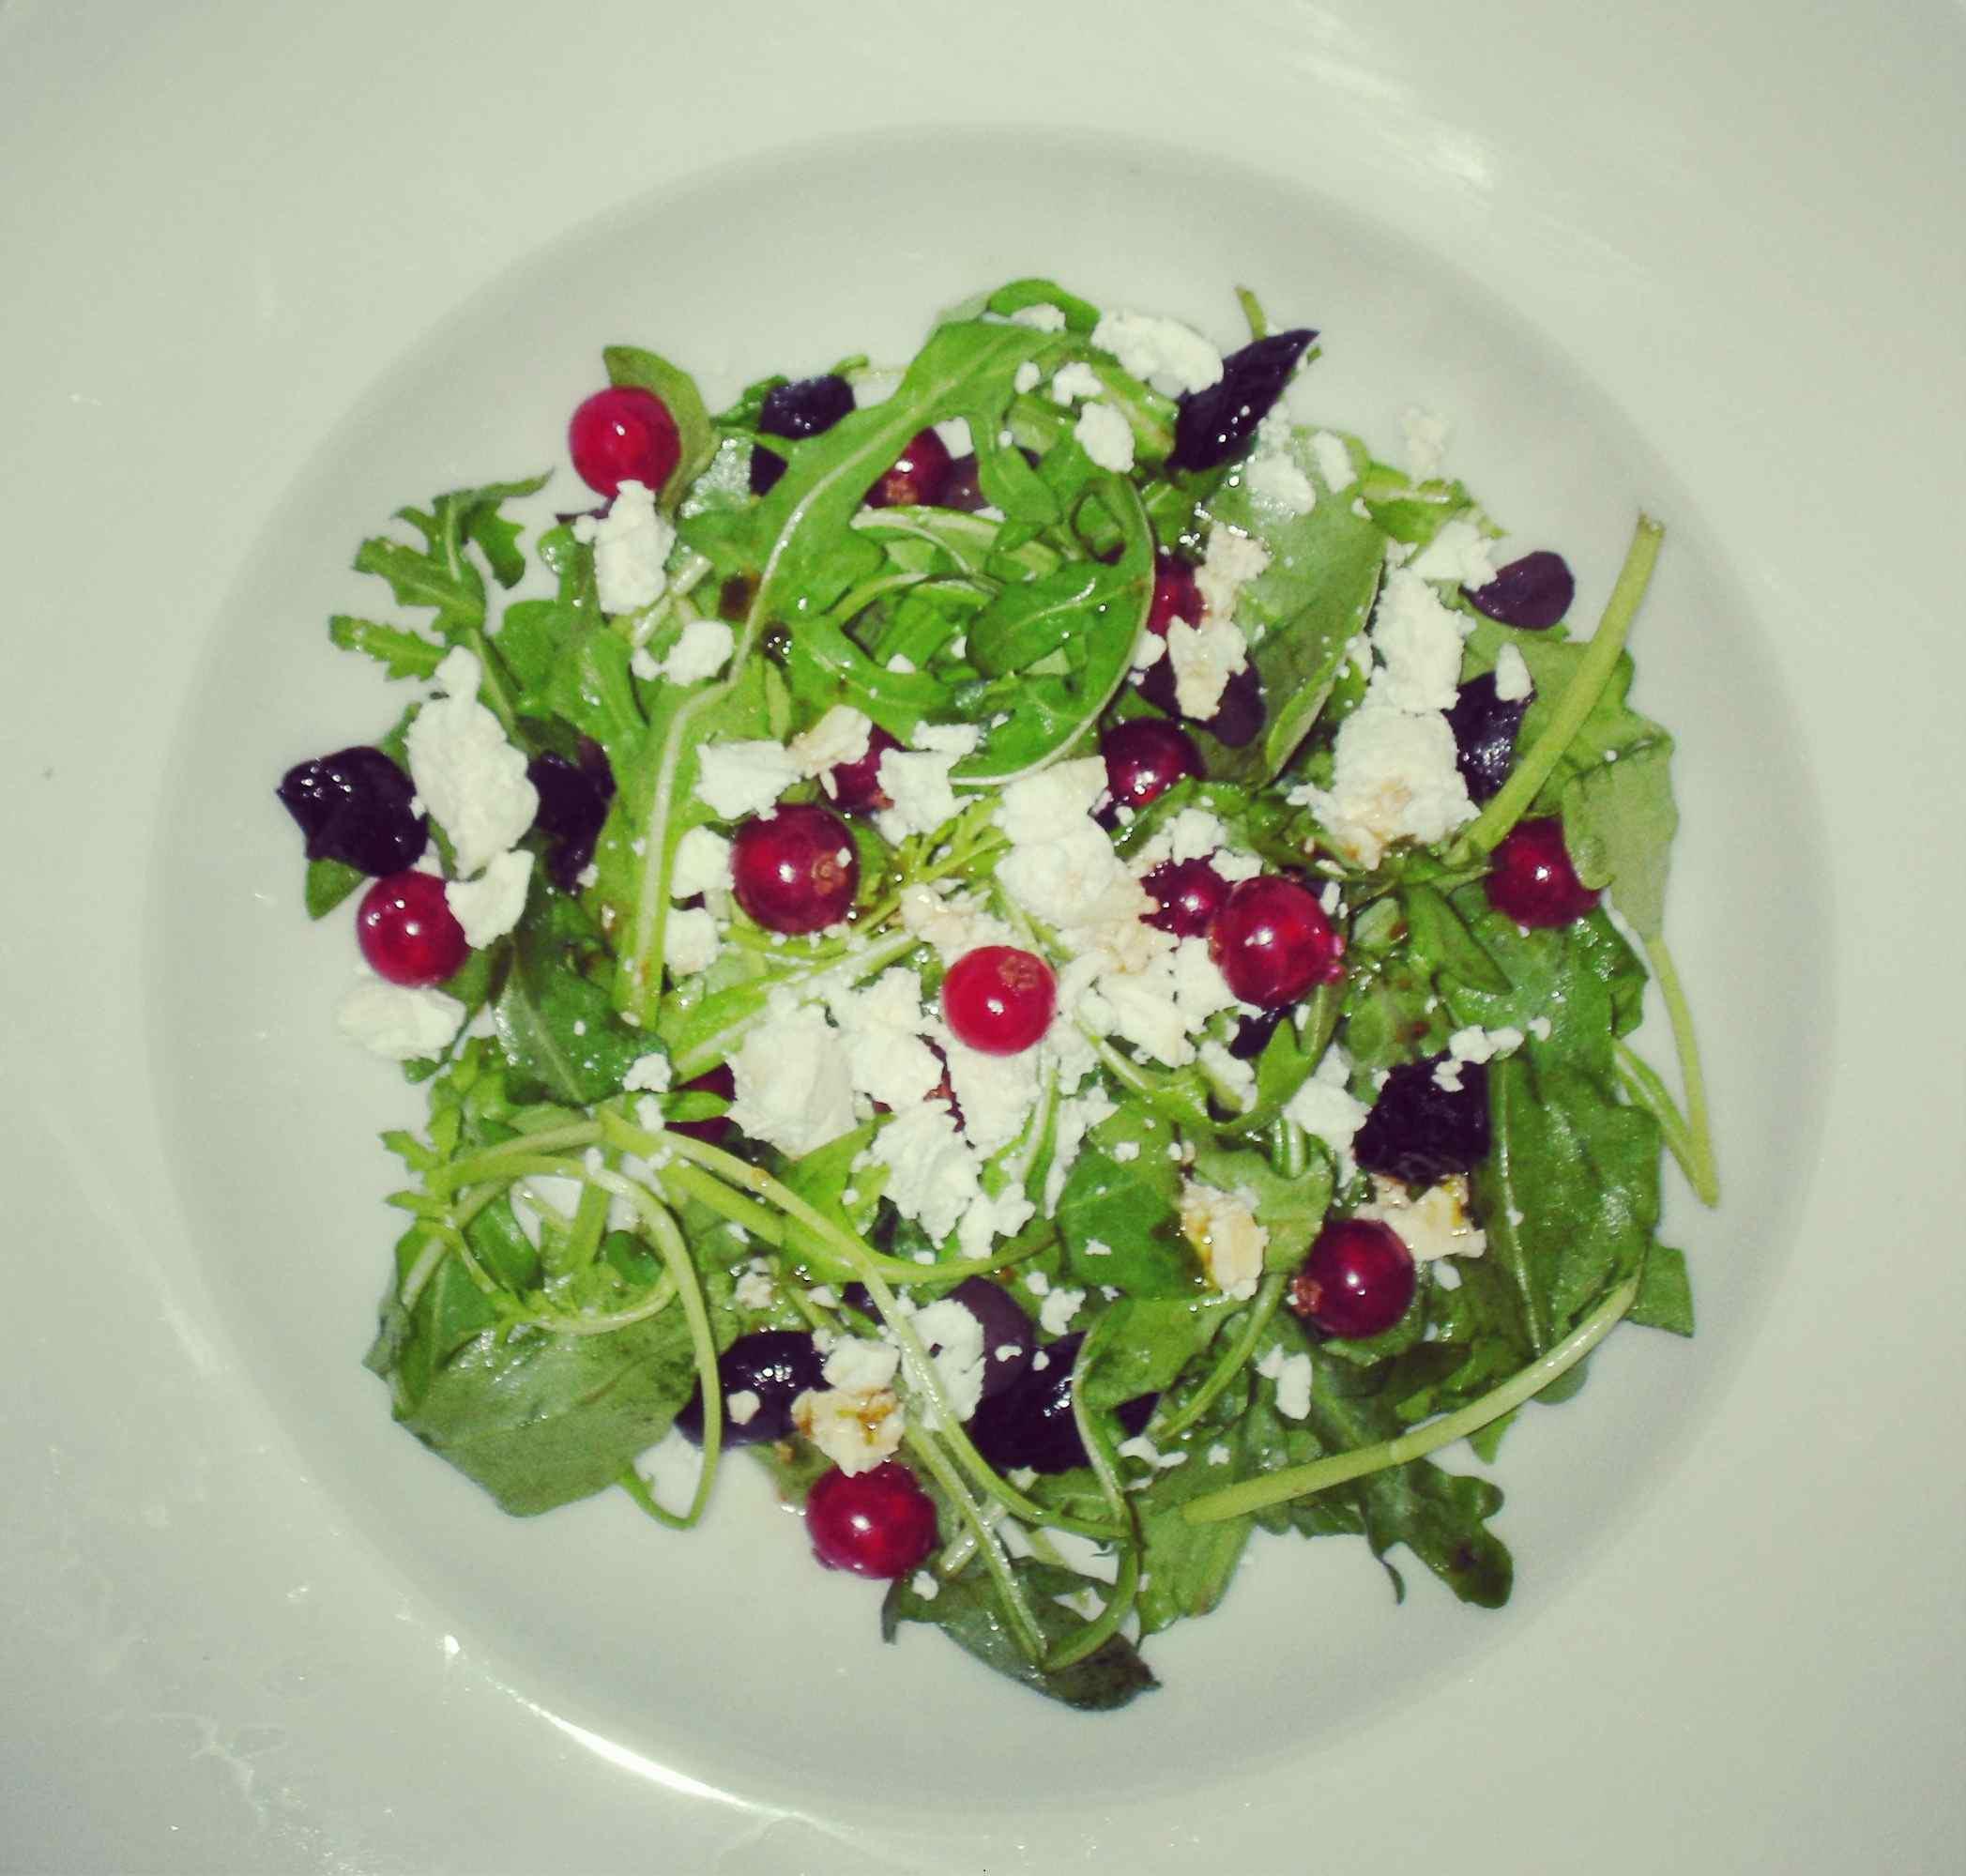 Salad with redcurrants, arugula & feta cheese